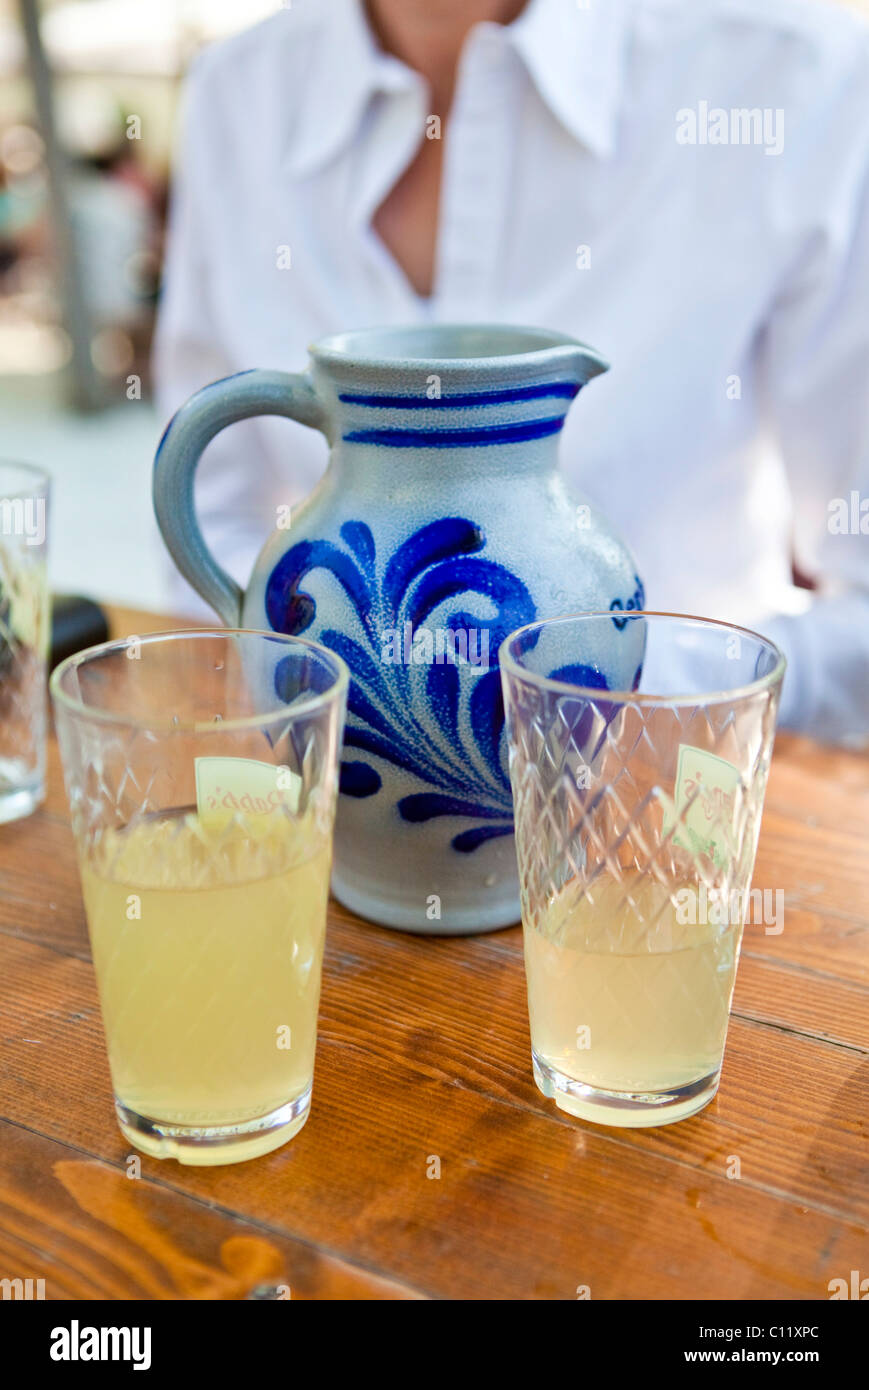 Cider and cider glasses with with a cider jug, Frankfurt, Hesse, Germany, Europe - Stock Image